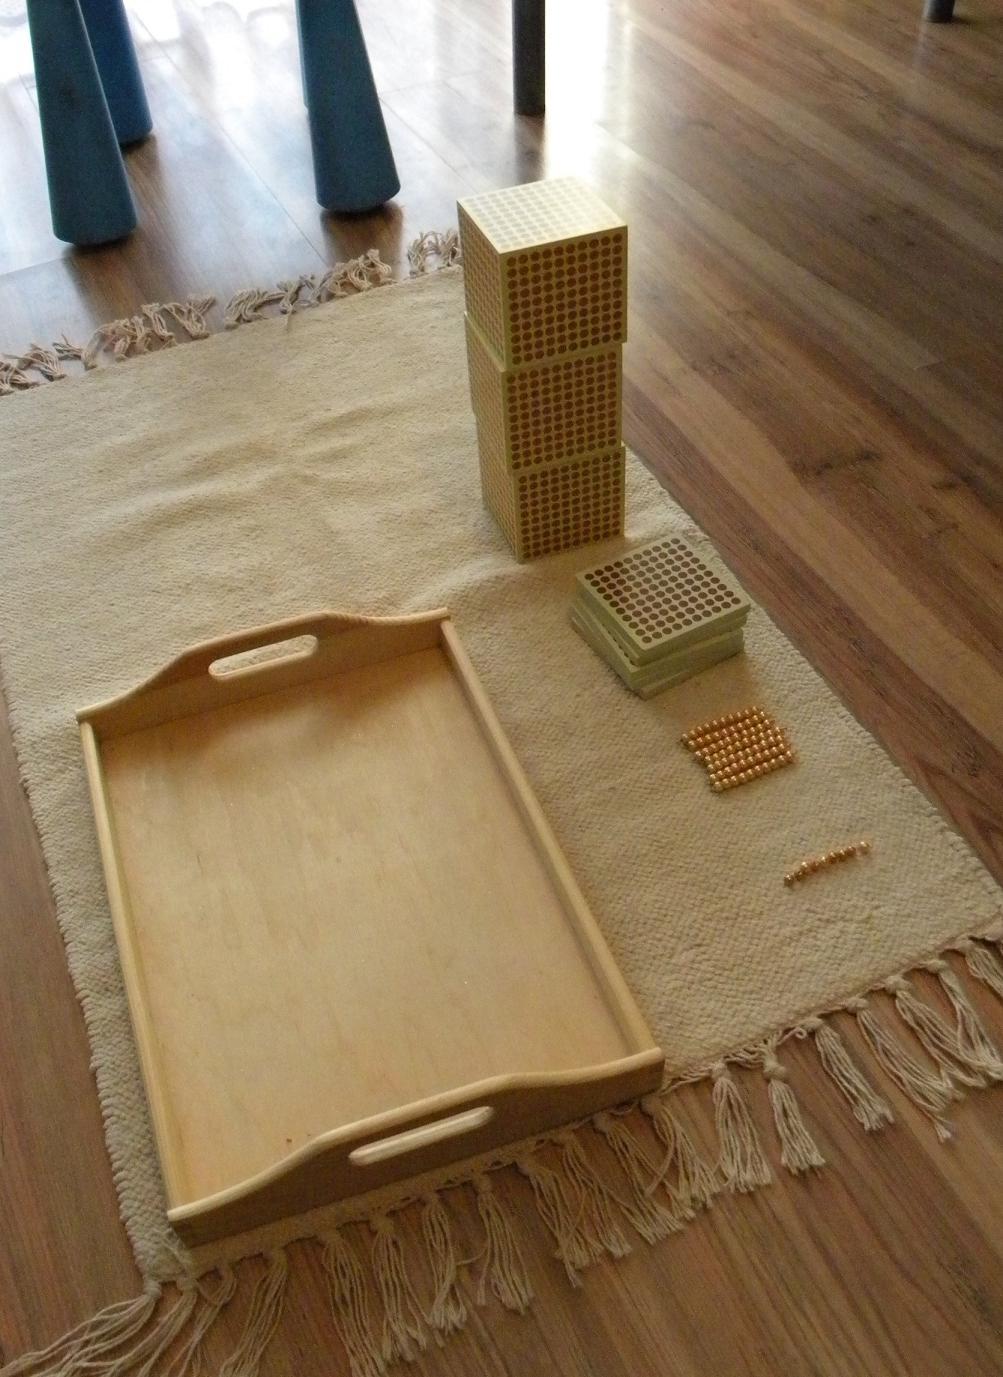 gra w bank ilo ci edukacja domowa montessori. Black Bedroom Furniture Sets. Home Design Ideas